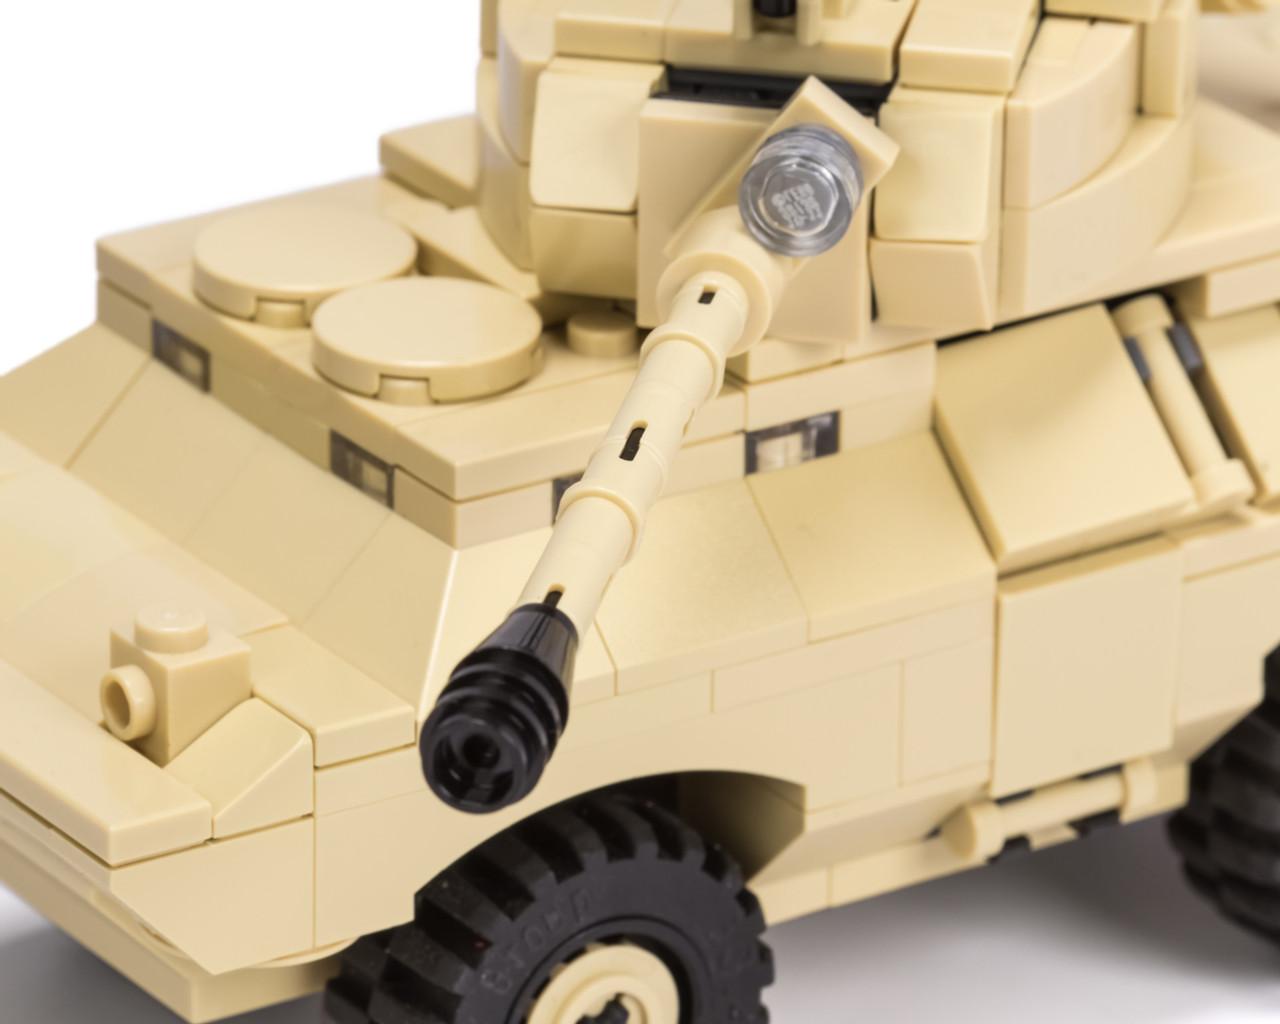 V-150 Commando - 4x4 Amphibious Armored Vehicle with 90mm Gun